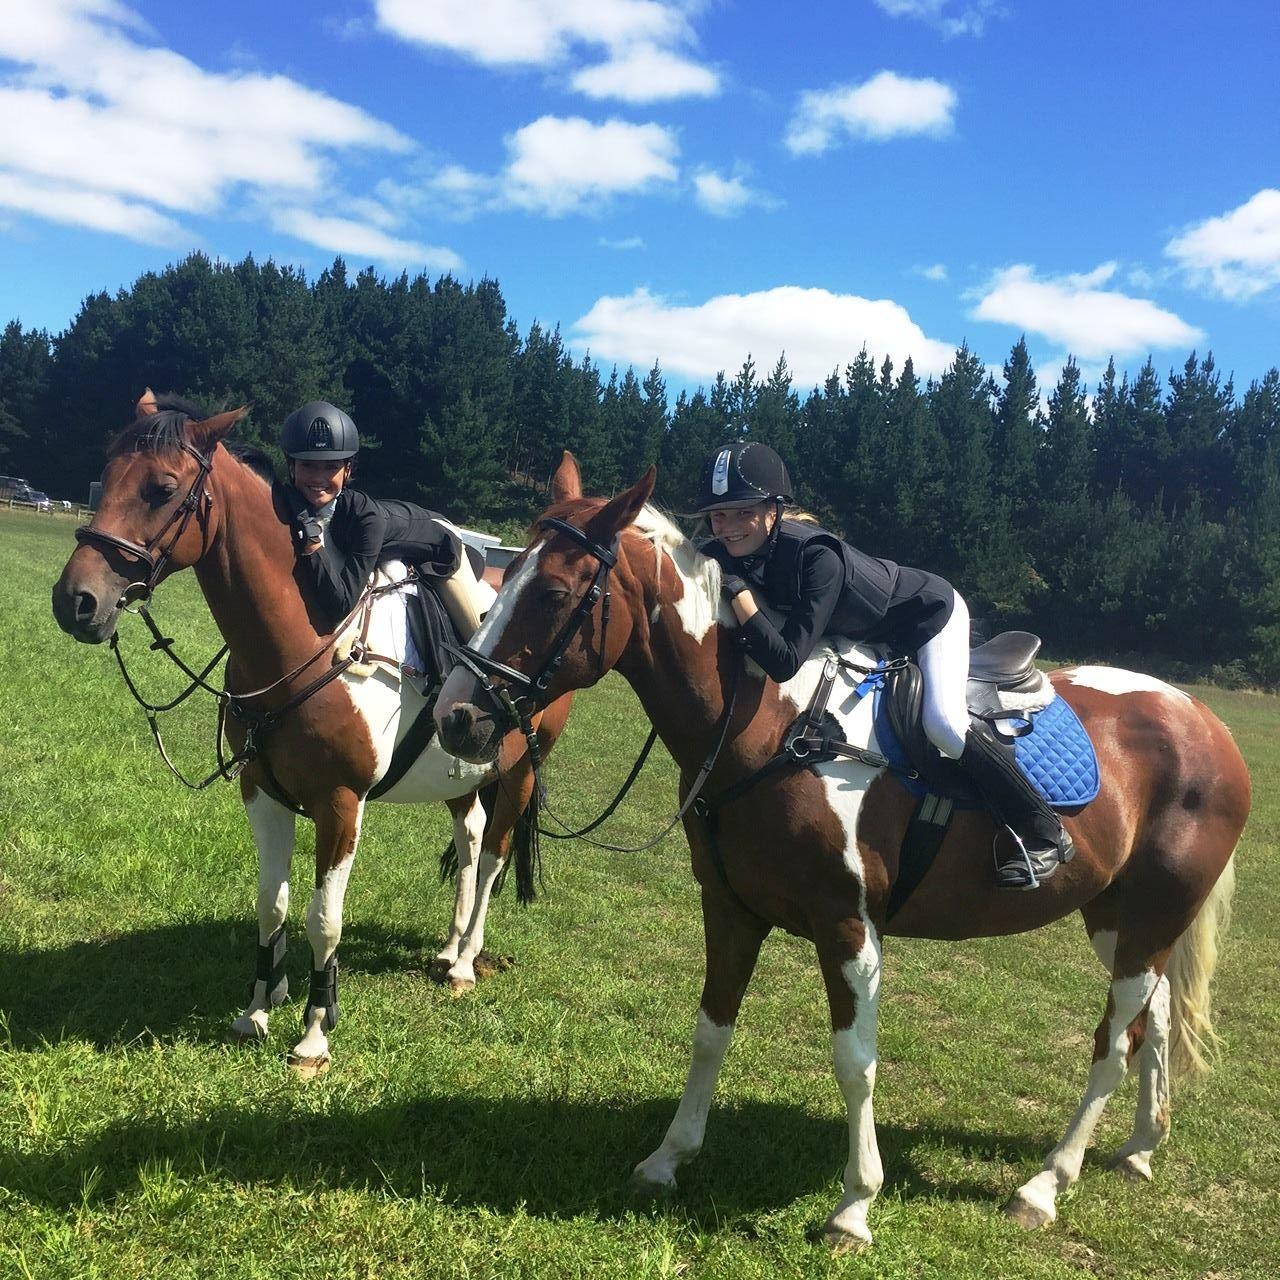 Kāpiti Equestrian & Vaulting Centre